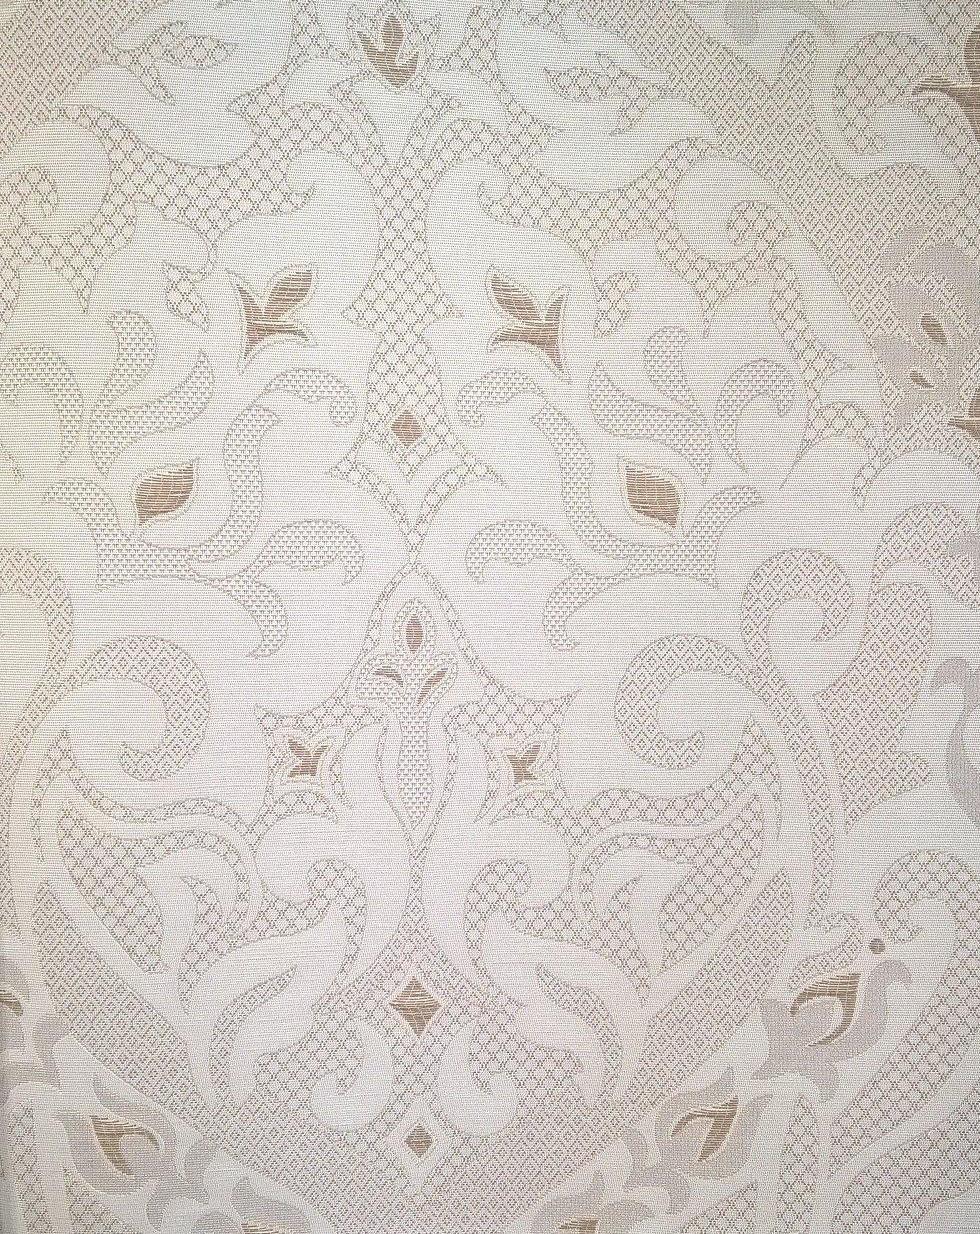 Немецкие обои Fuggerhaus,  коллекция Palazzo D'oro, артикул4797-27